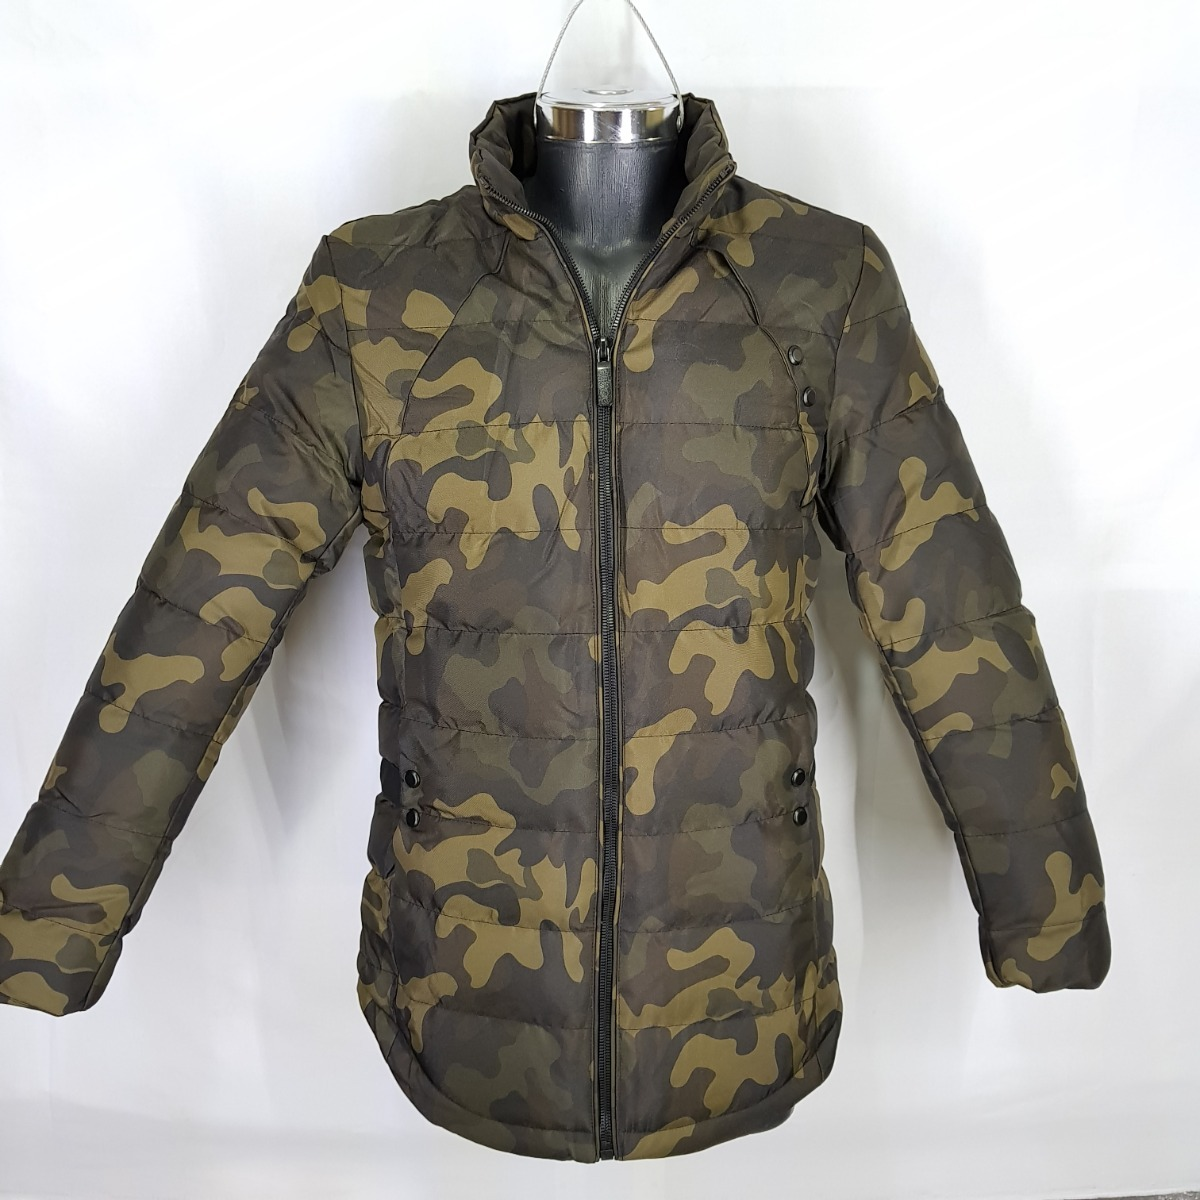 cf7c4db1f51af4 cazadora-camuflaje-chamarra-termica-abrigo-militar-peluche-D_NQ_NP_626392-MLM29008845639_122018-F.jpg